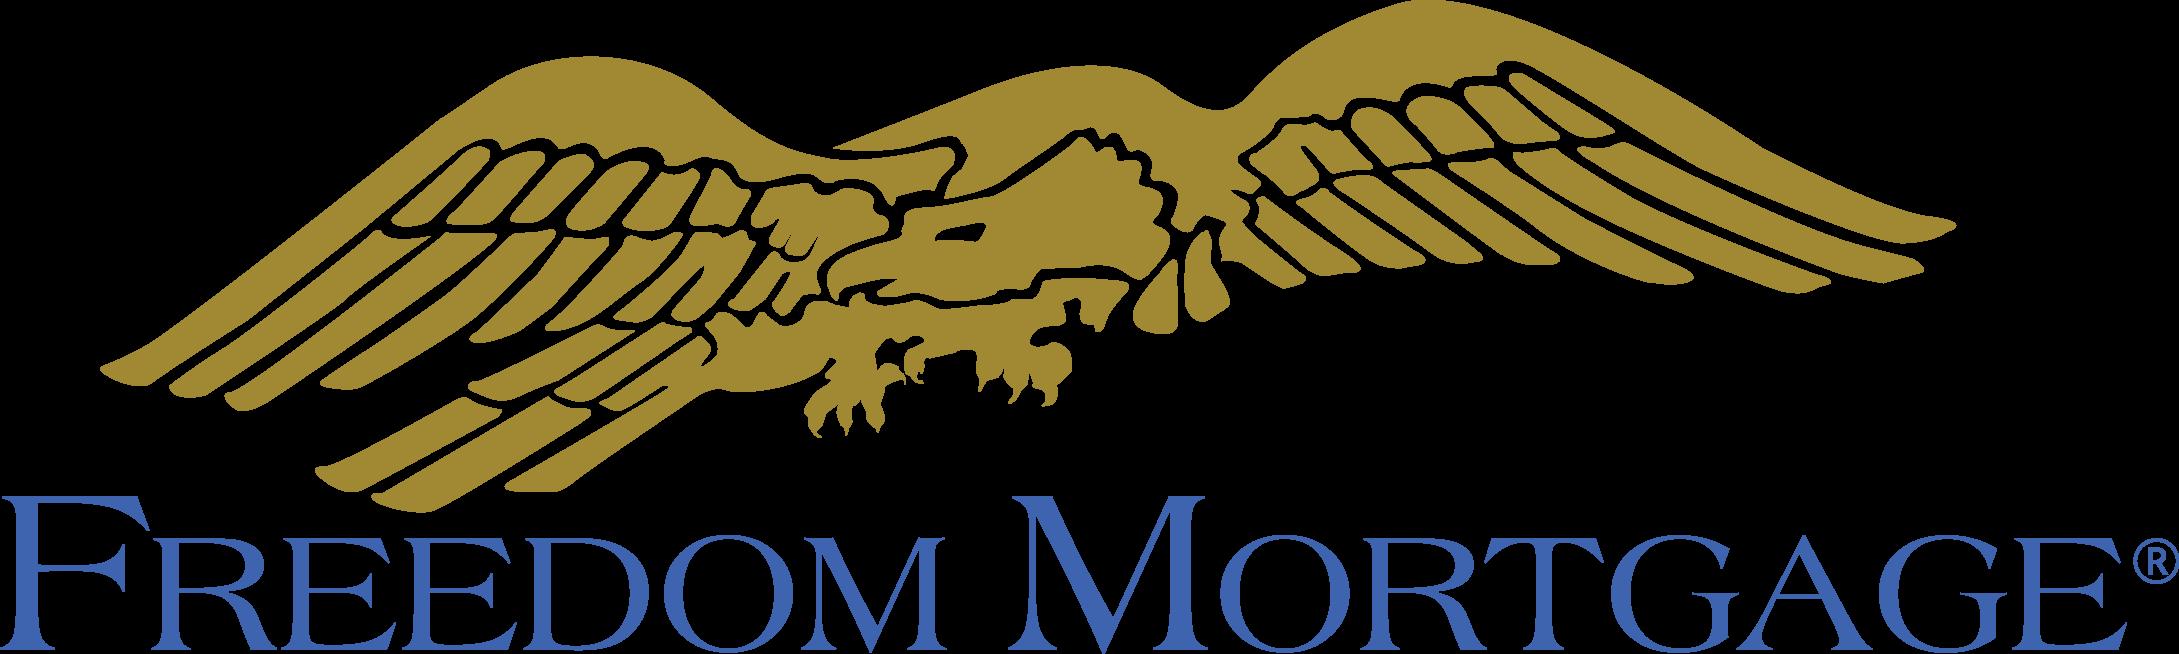 [image of company logo]